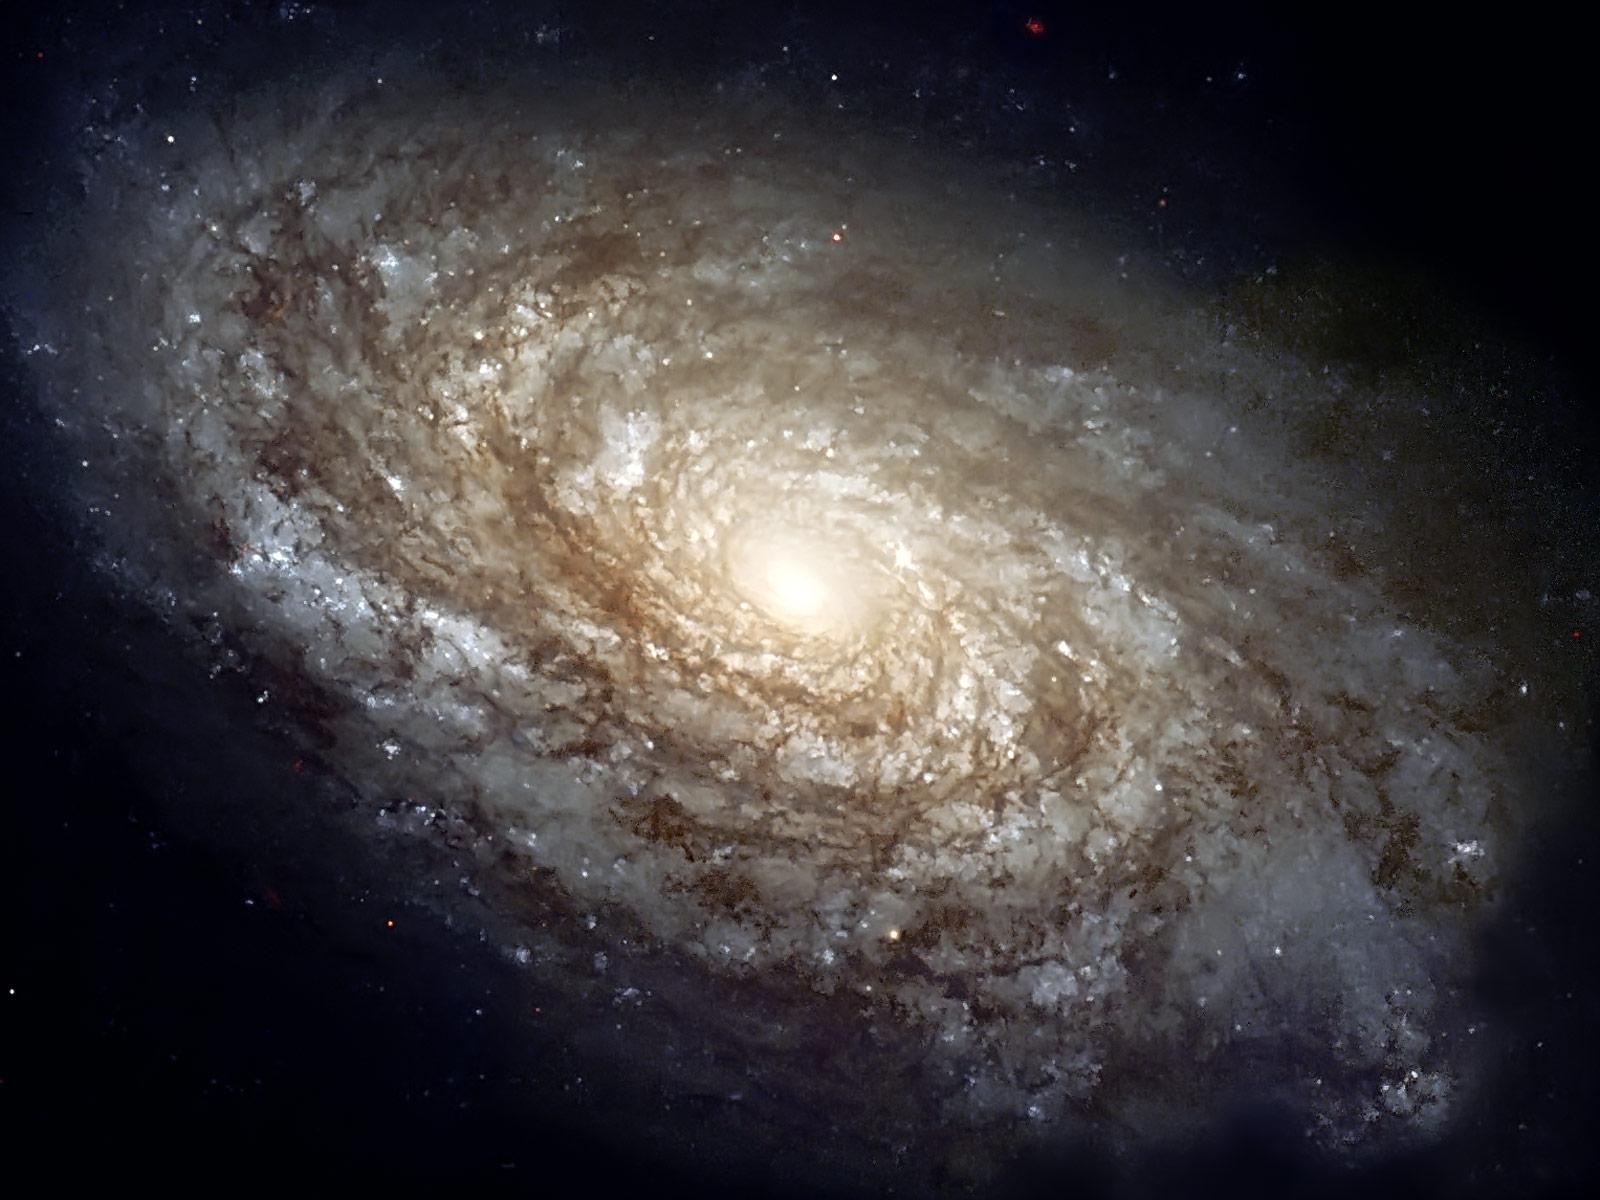 galaxy-wallpaper-background-HD_09